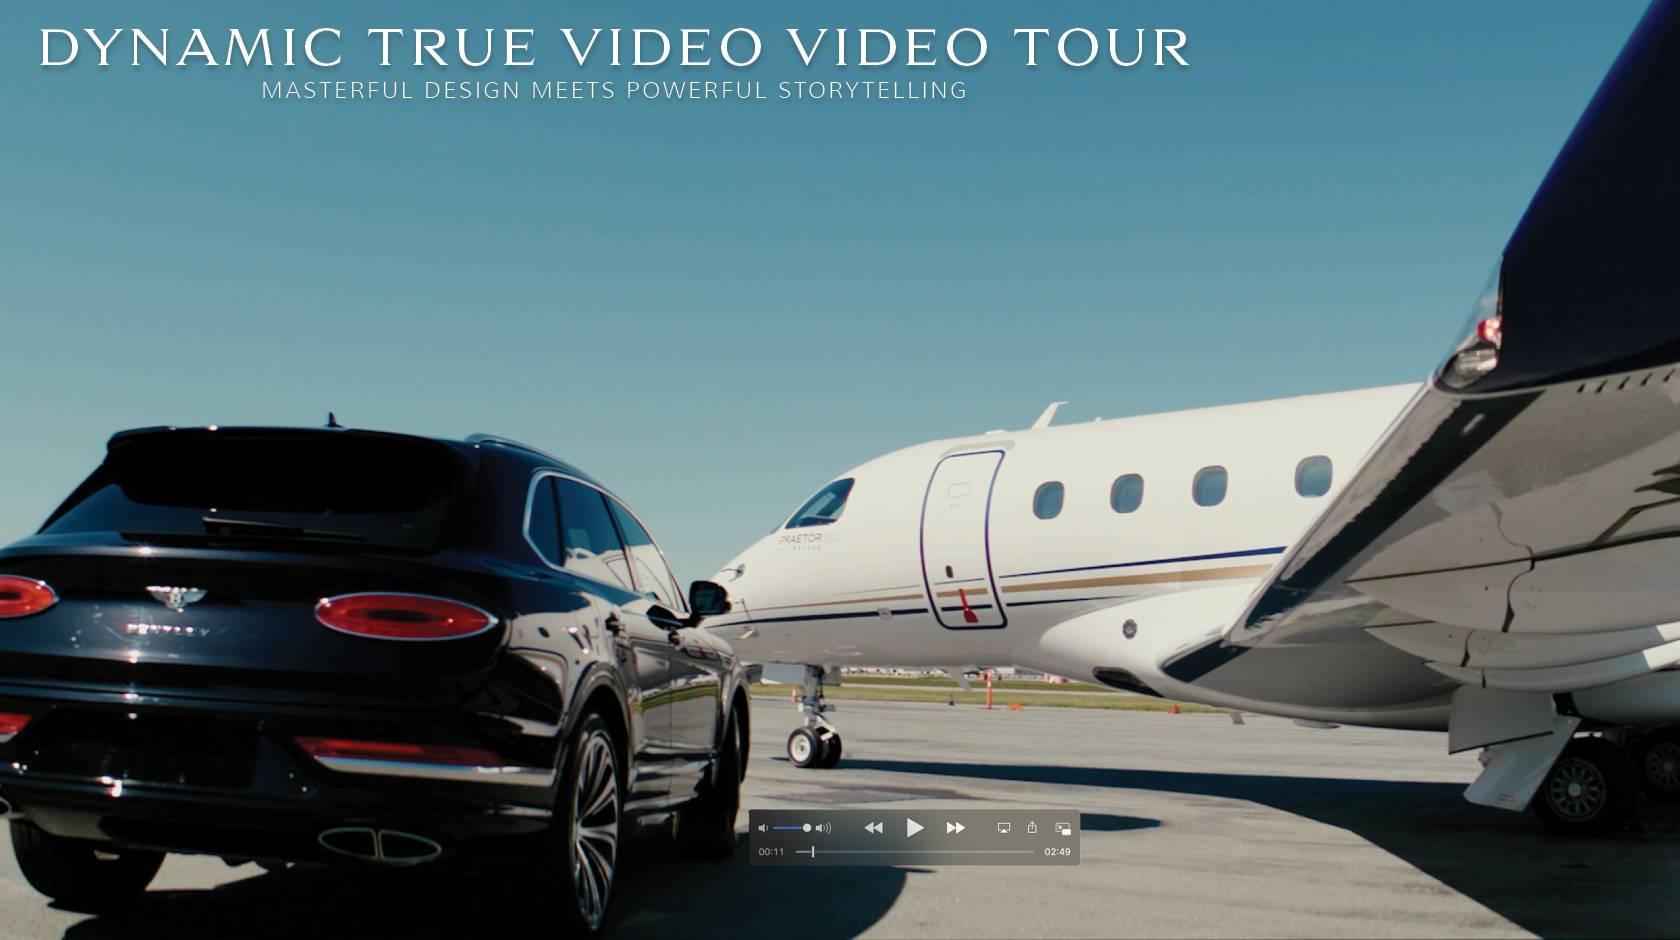 Dynamic True Tour Videos